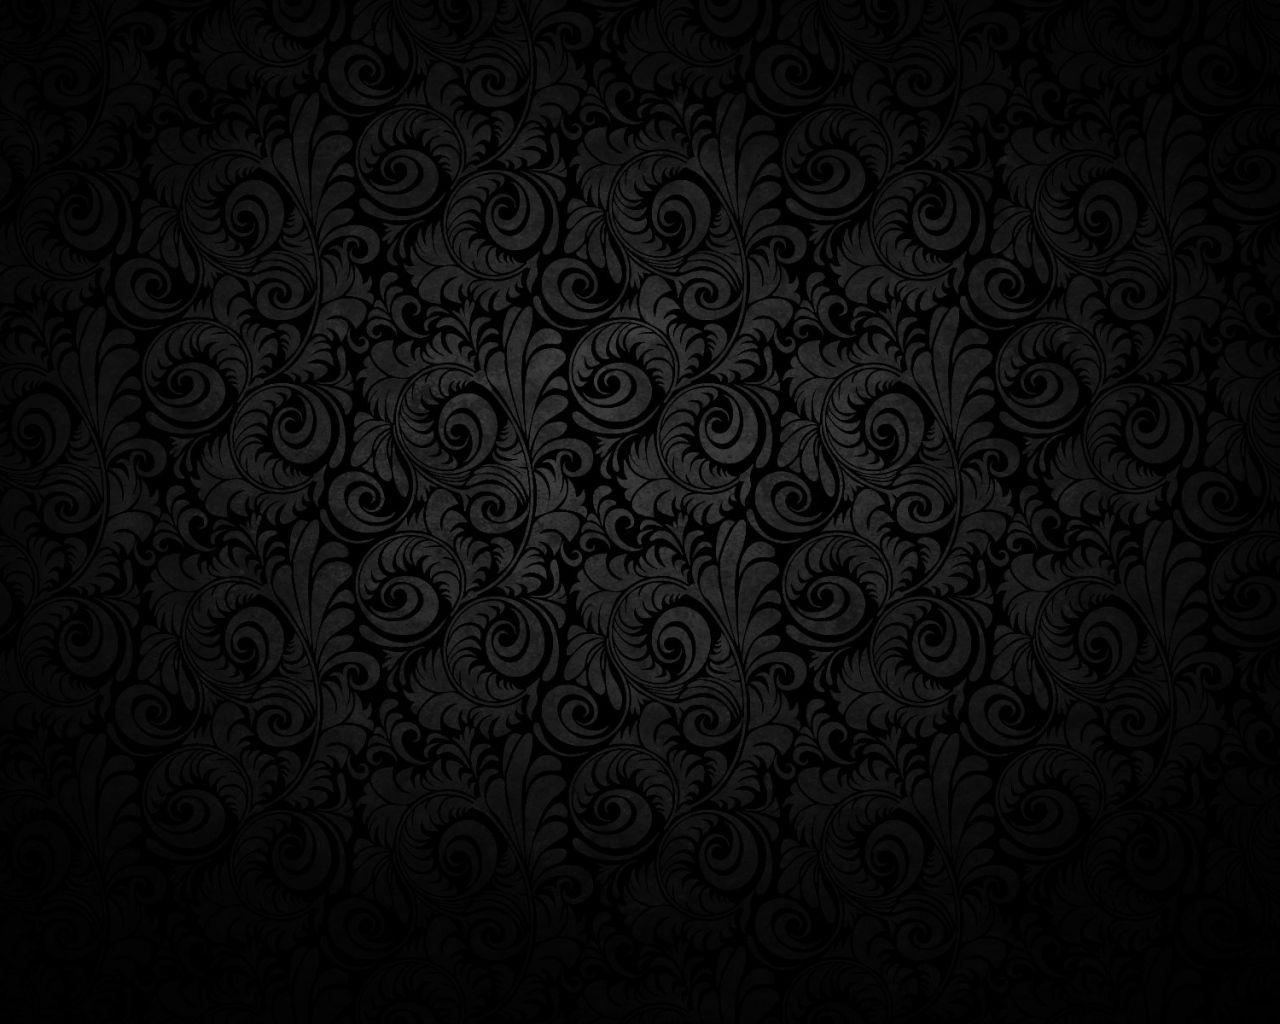 1280x1024 Oboi Chernyj Fon Uzory Svet Tekstura Chernyj Fon